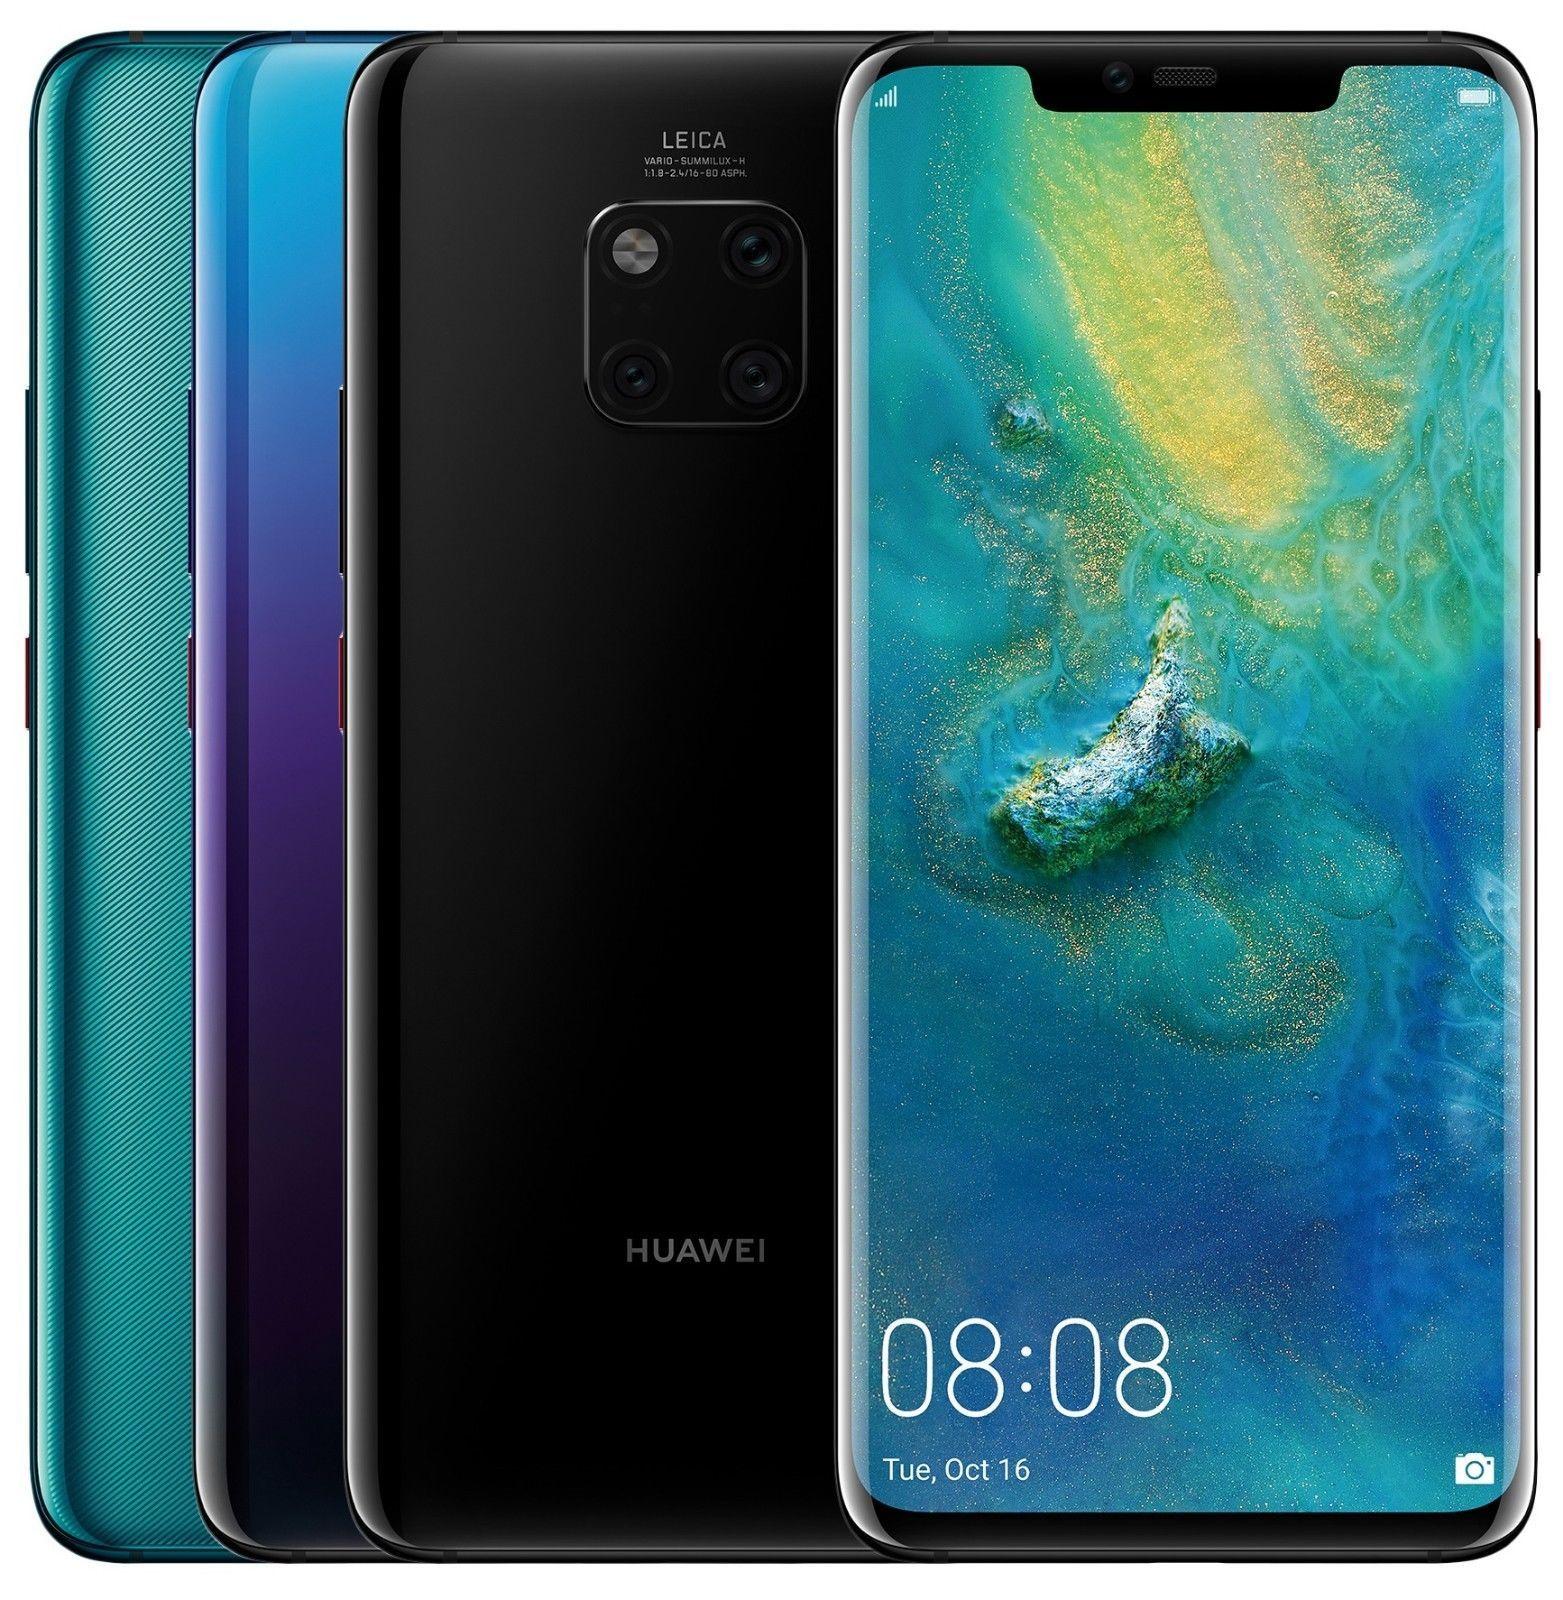 Huawei Mate 20 Pro Lya L29 128gb Factory Unlocked 6 39 Black Green Twilight Prepaid Phones T Mobile Phones Boost Mobile